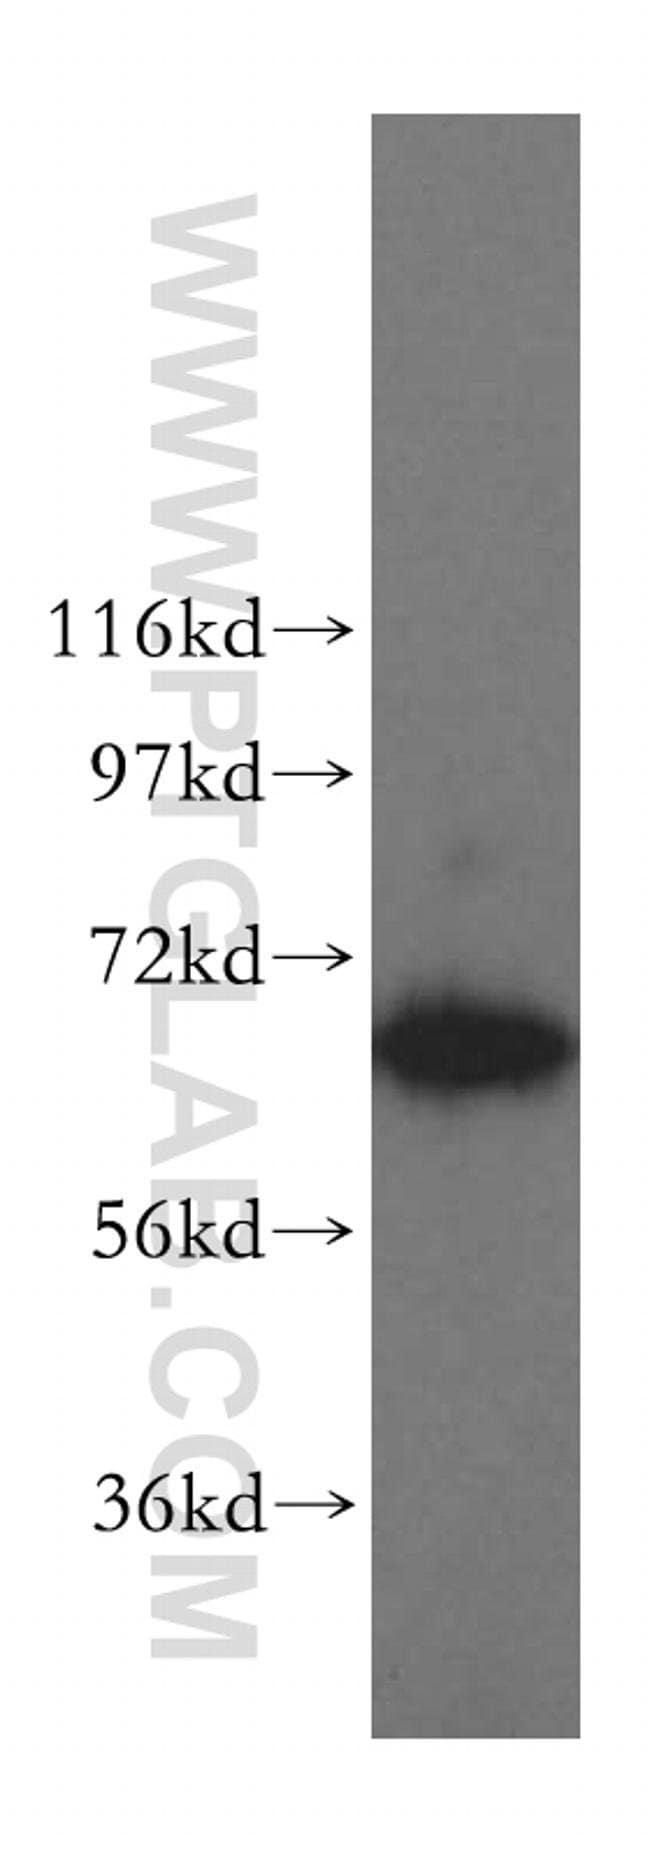 TBRG4 Rabbit anti-Human, Mouse, Rat, Polyclonal, Proteintech 150 μL; Unconjugated Produkte